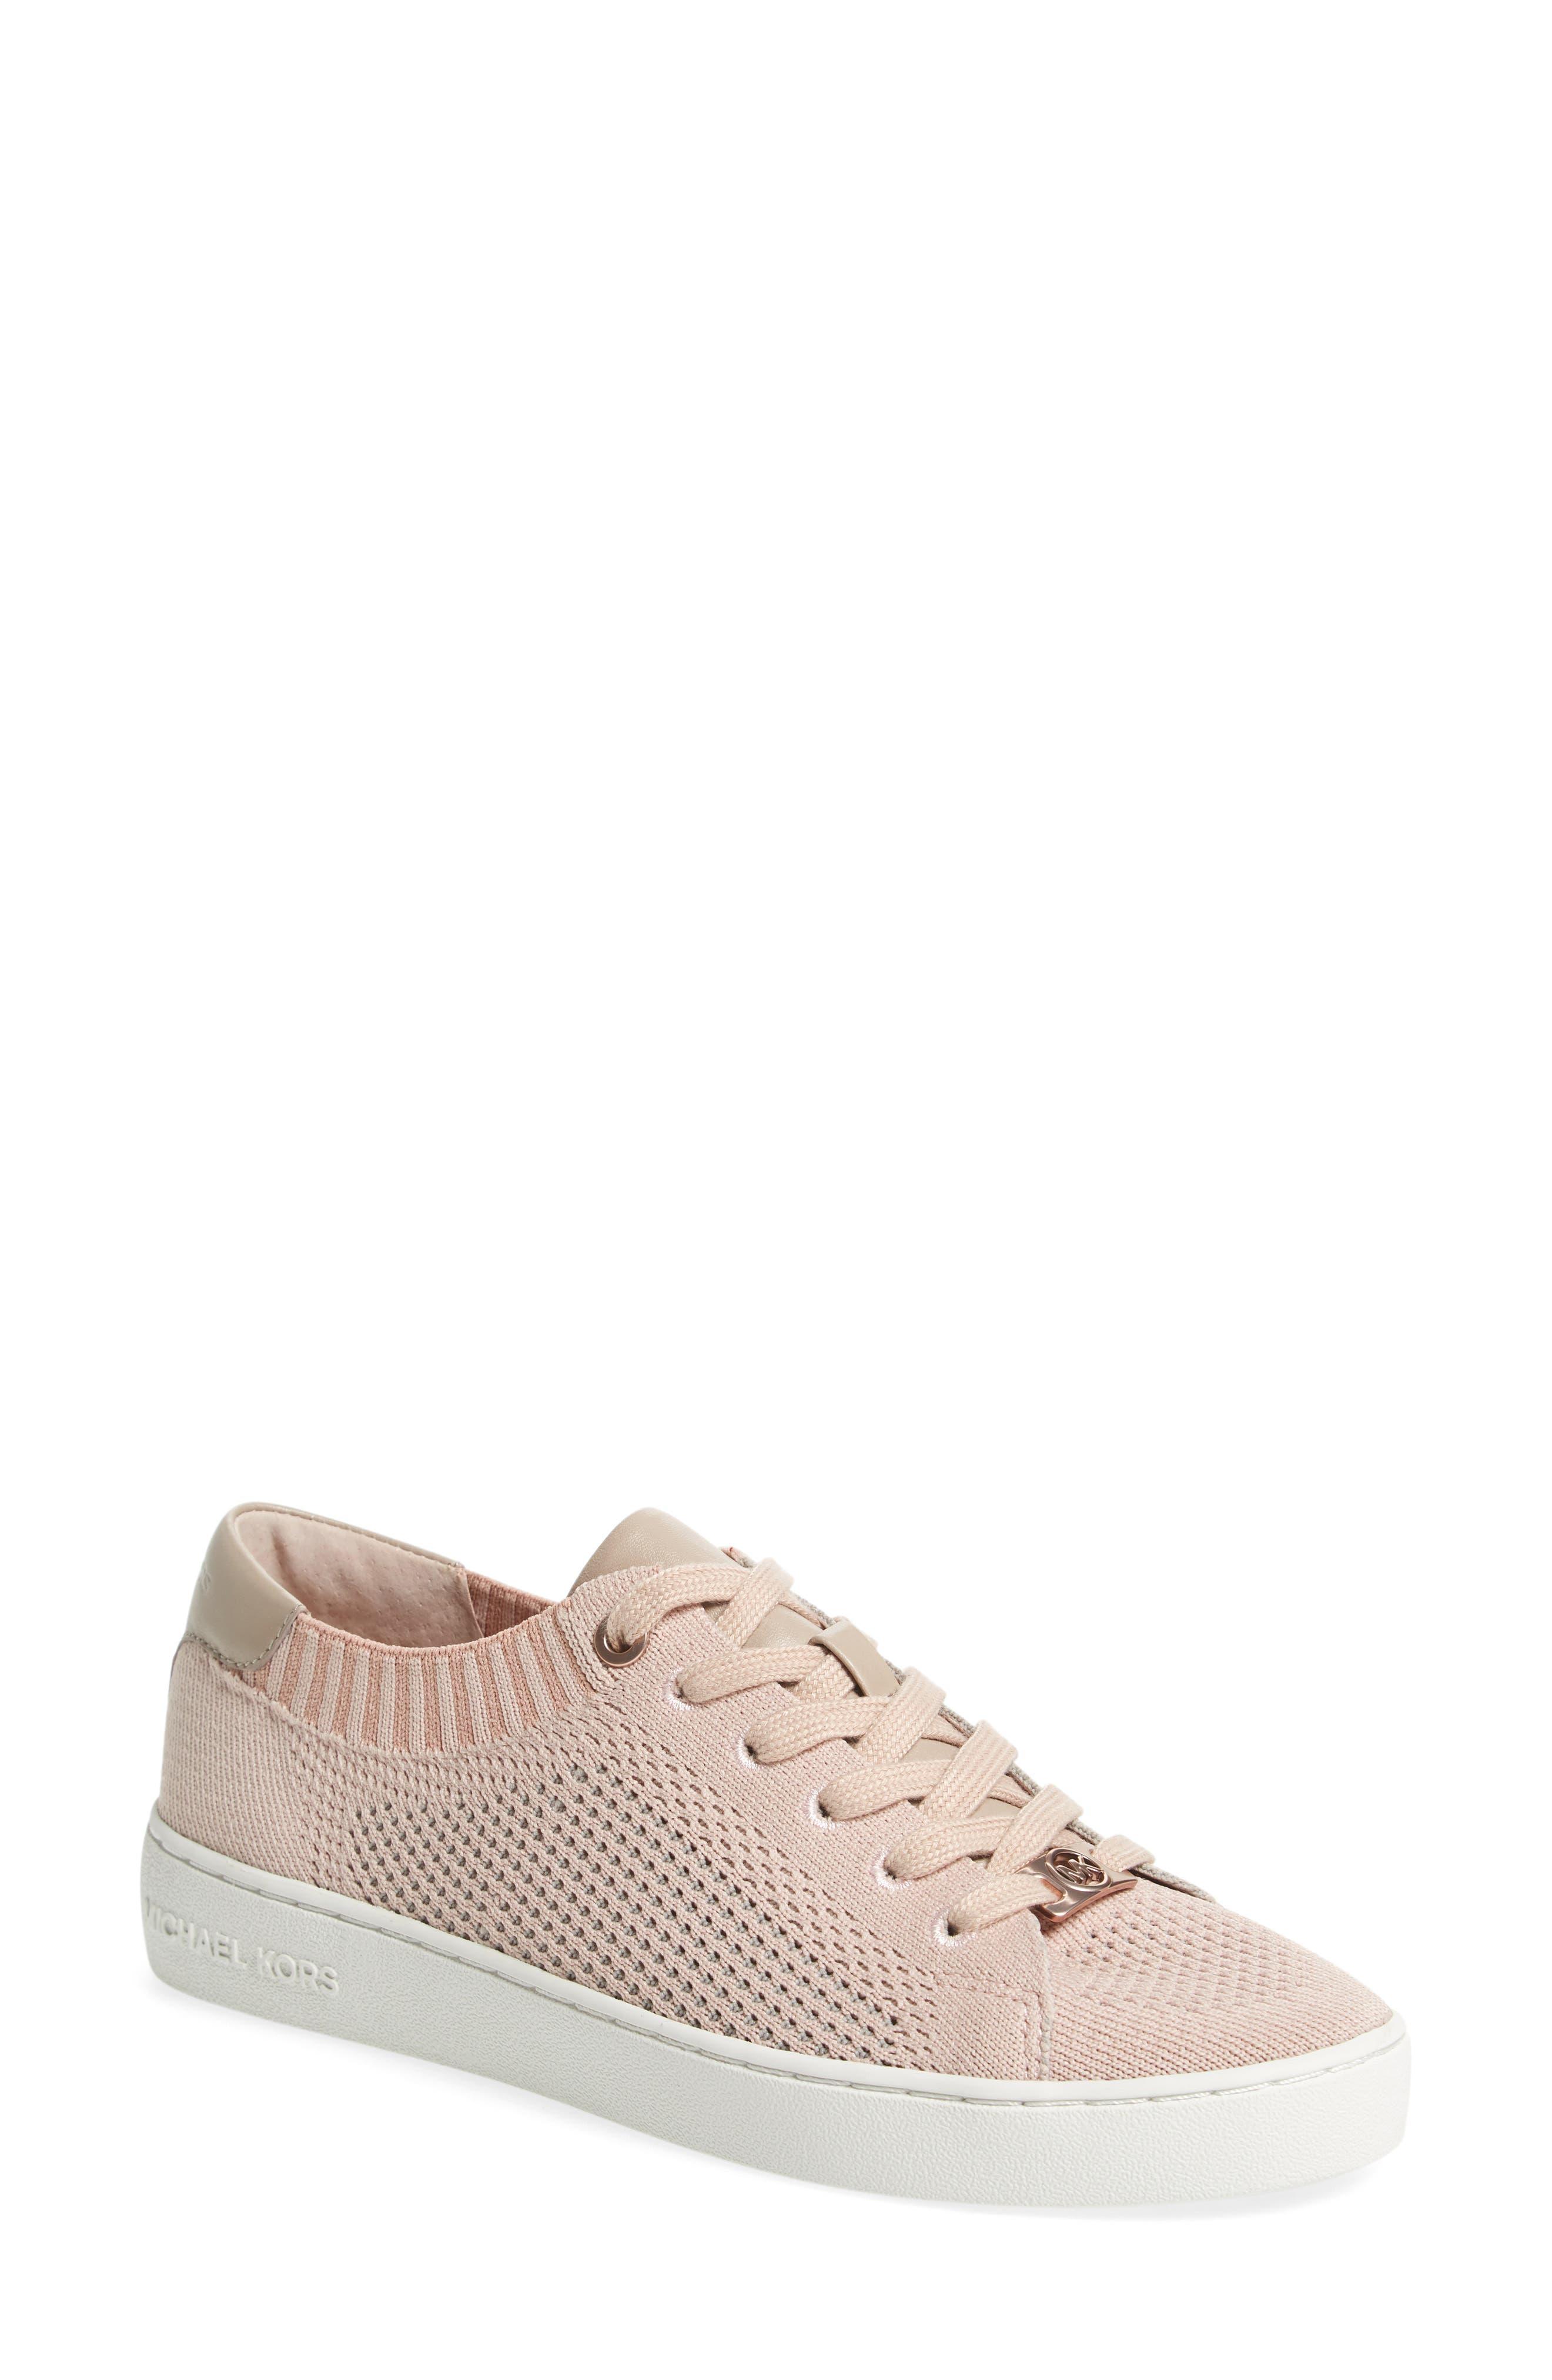 09cb5e6ca7d9 Buy michael kors tennis shoe white   OFF71% Discounted